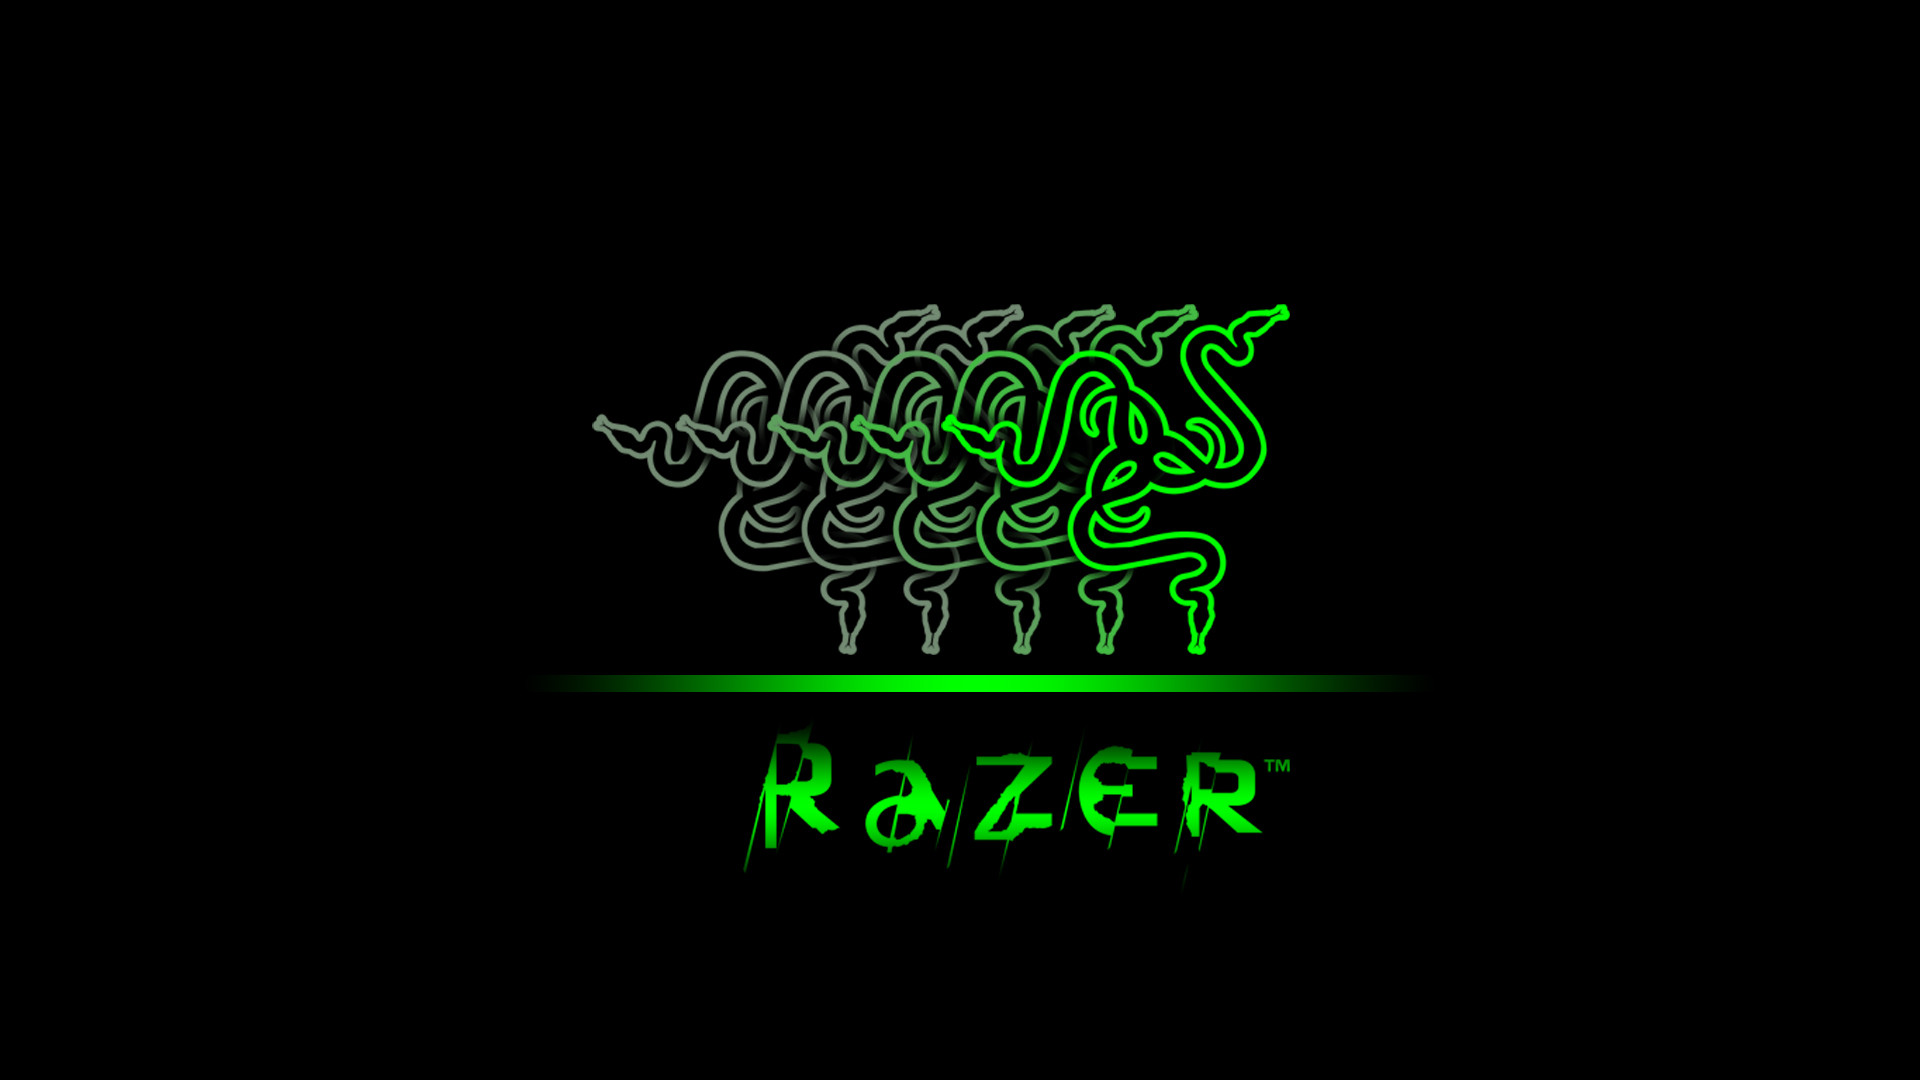 <b>Razer</b> Chroma <b>Wallpaper</b